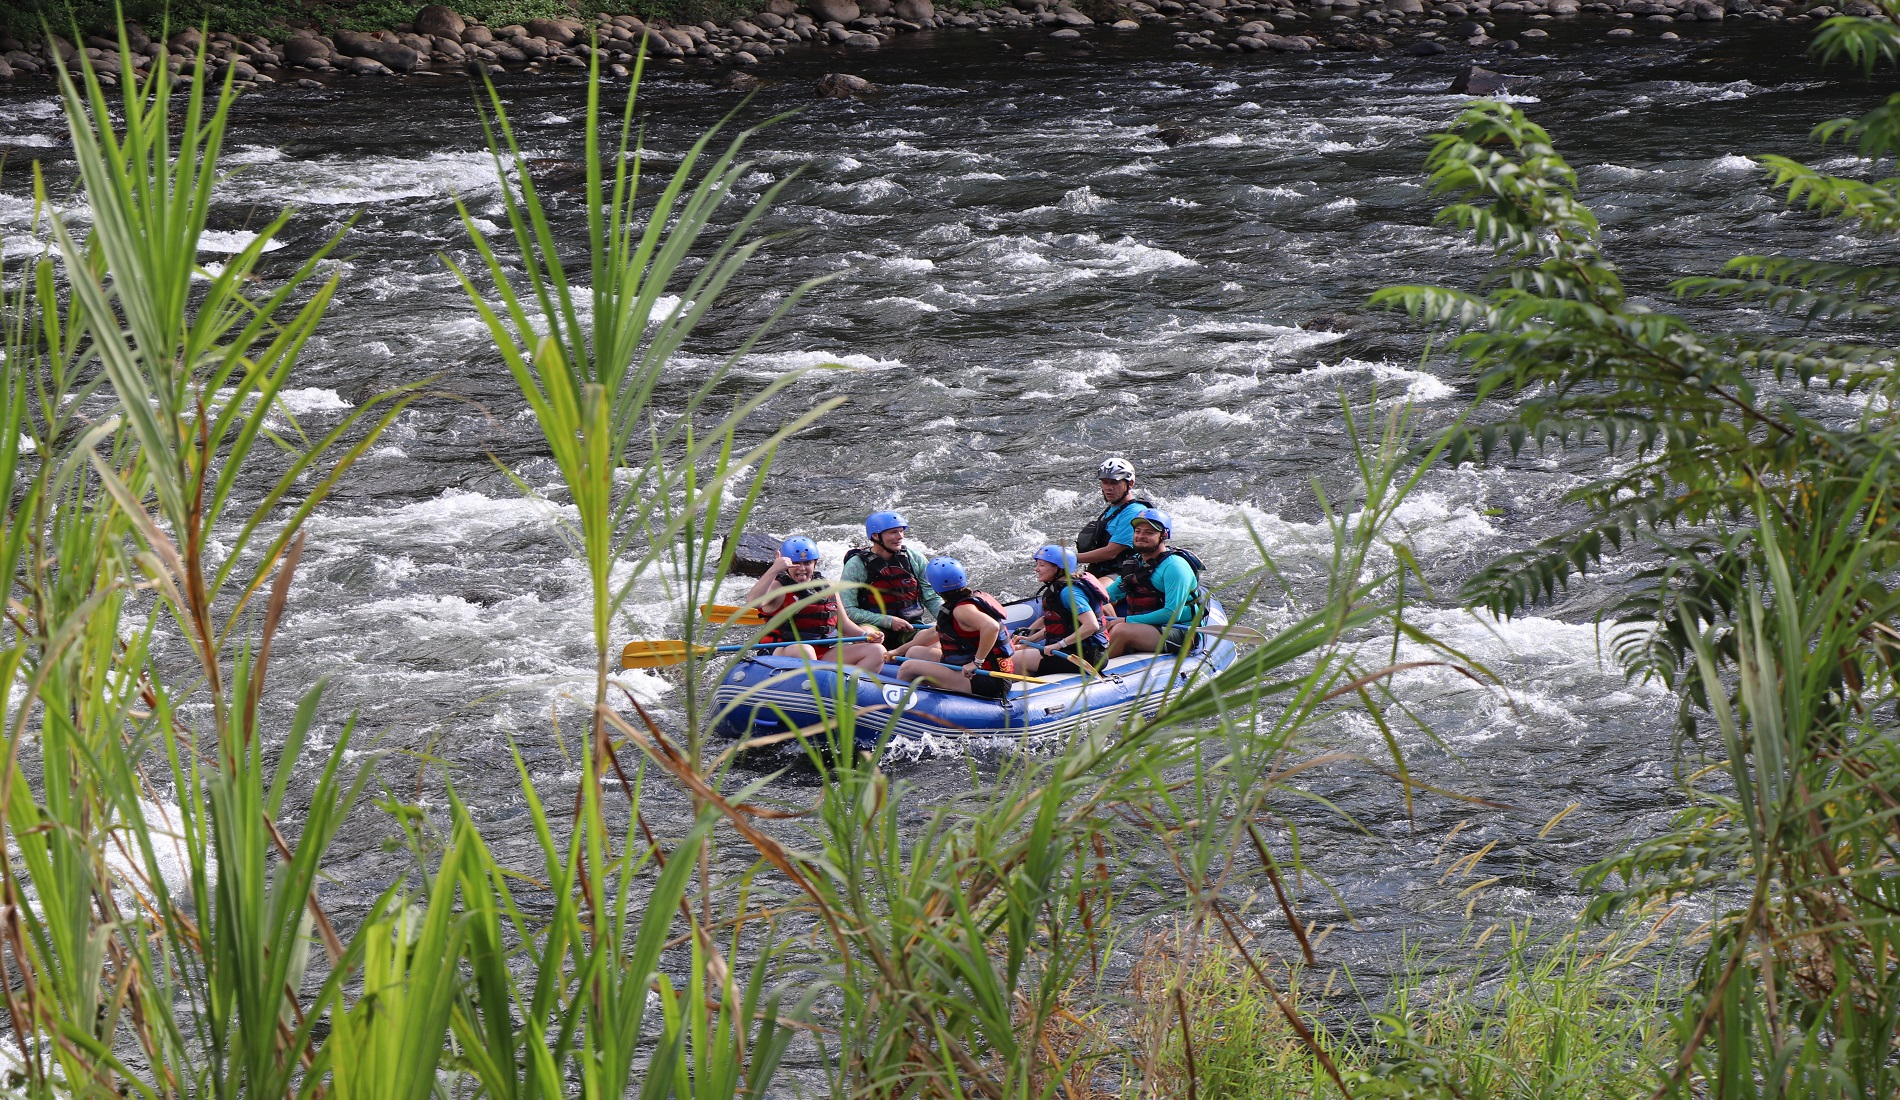 Sarapiqui rivier raften